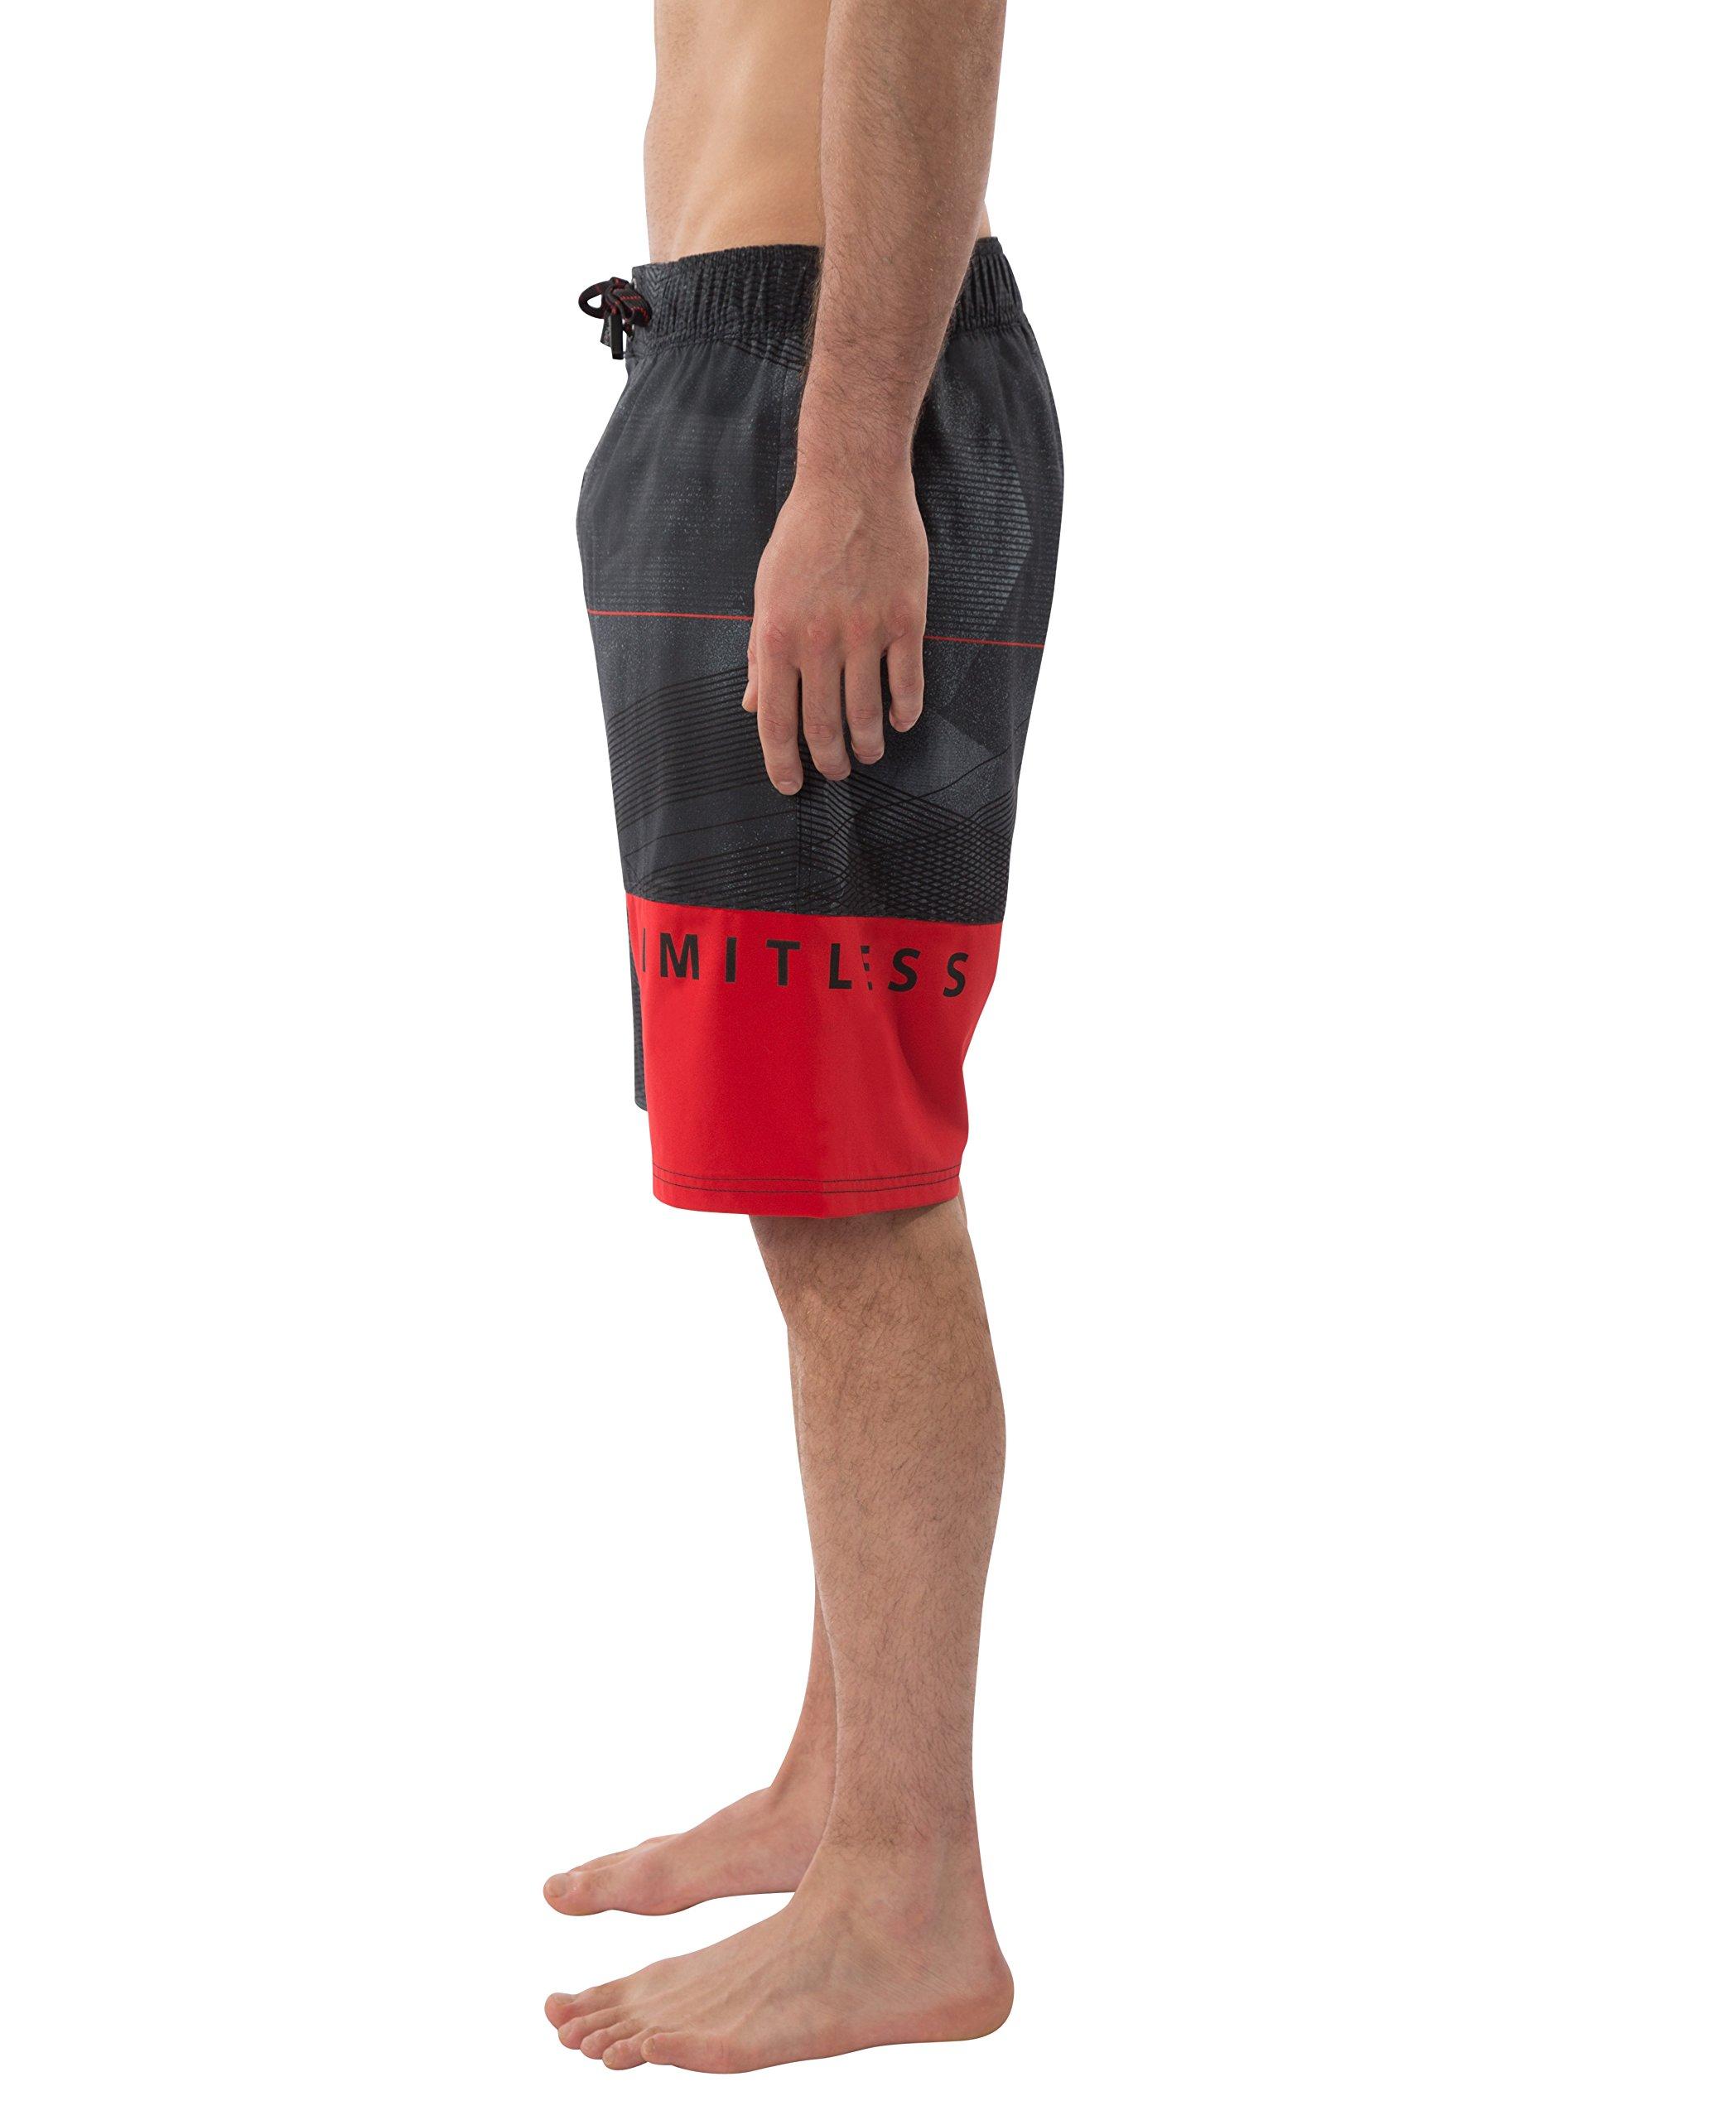 Private Label Stretch Ergo Swim Short (Small, Black)